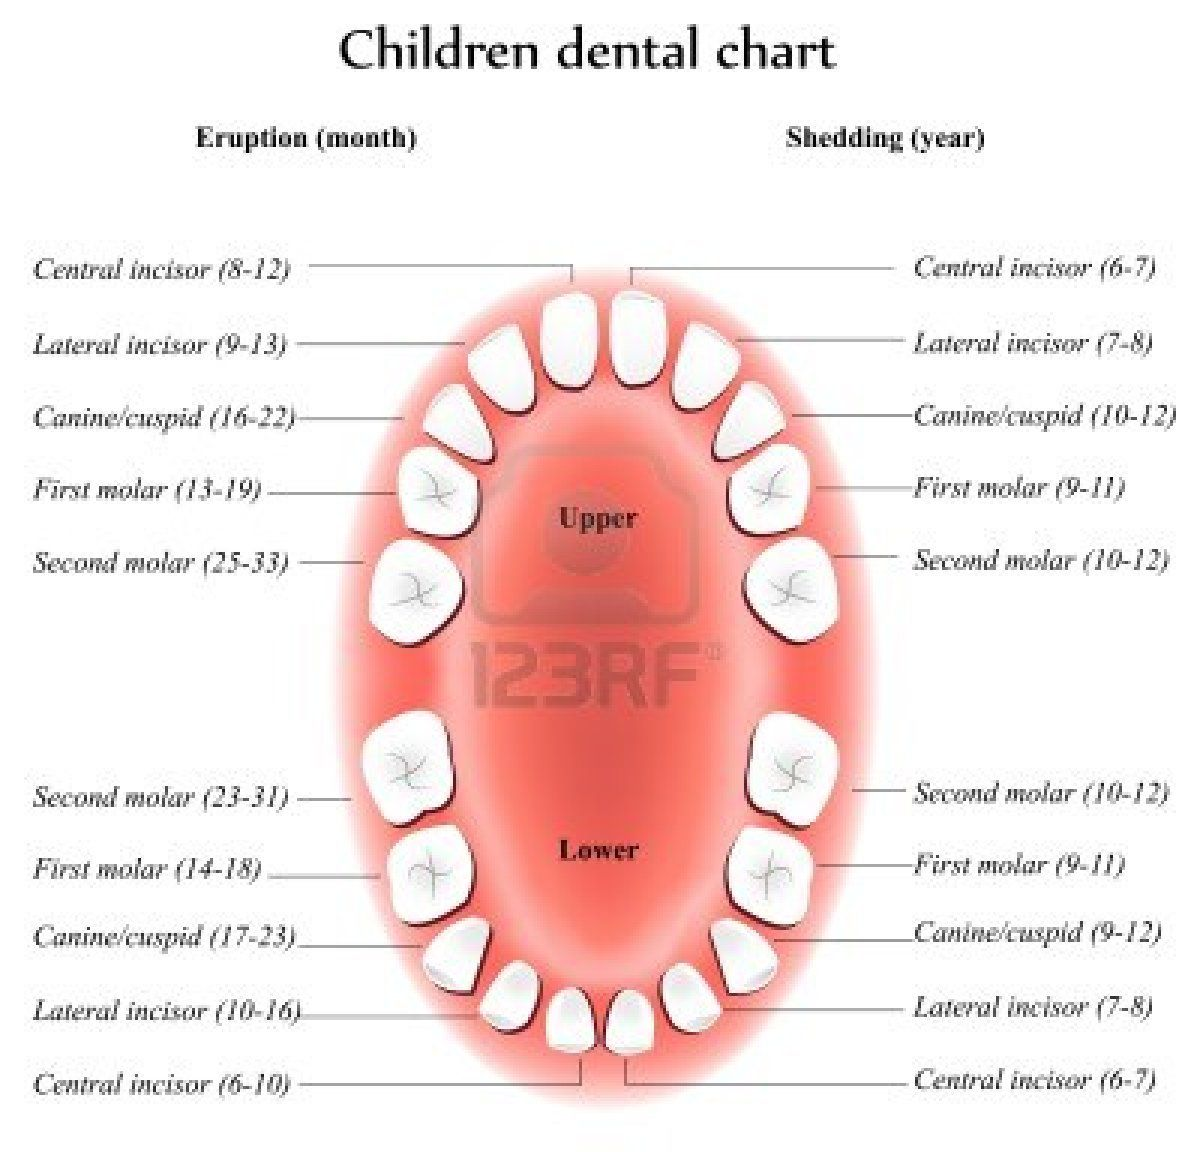 dental stuff Back to life #healthupyourlife twitter and pinterest @klmircea and #healthupyourlife back to life #healthupyourlife twitter and pinterest @klmircea and #healthupyourlife.